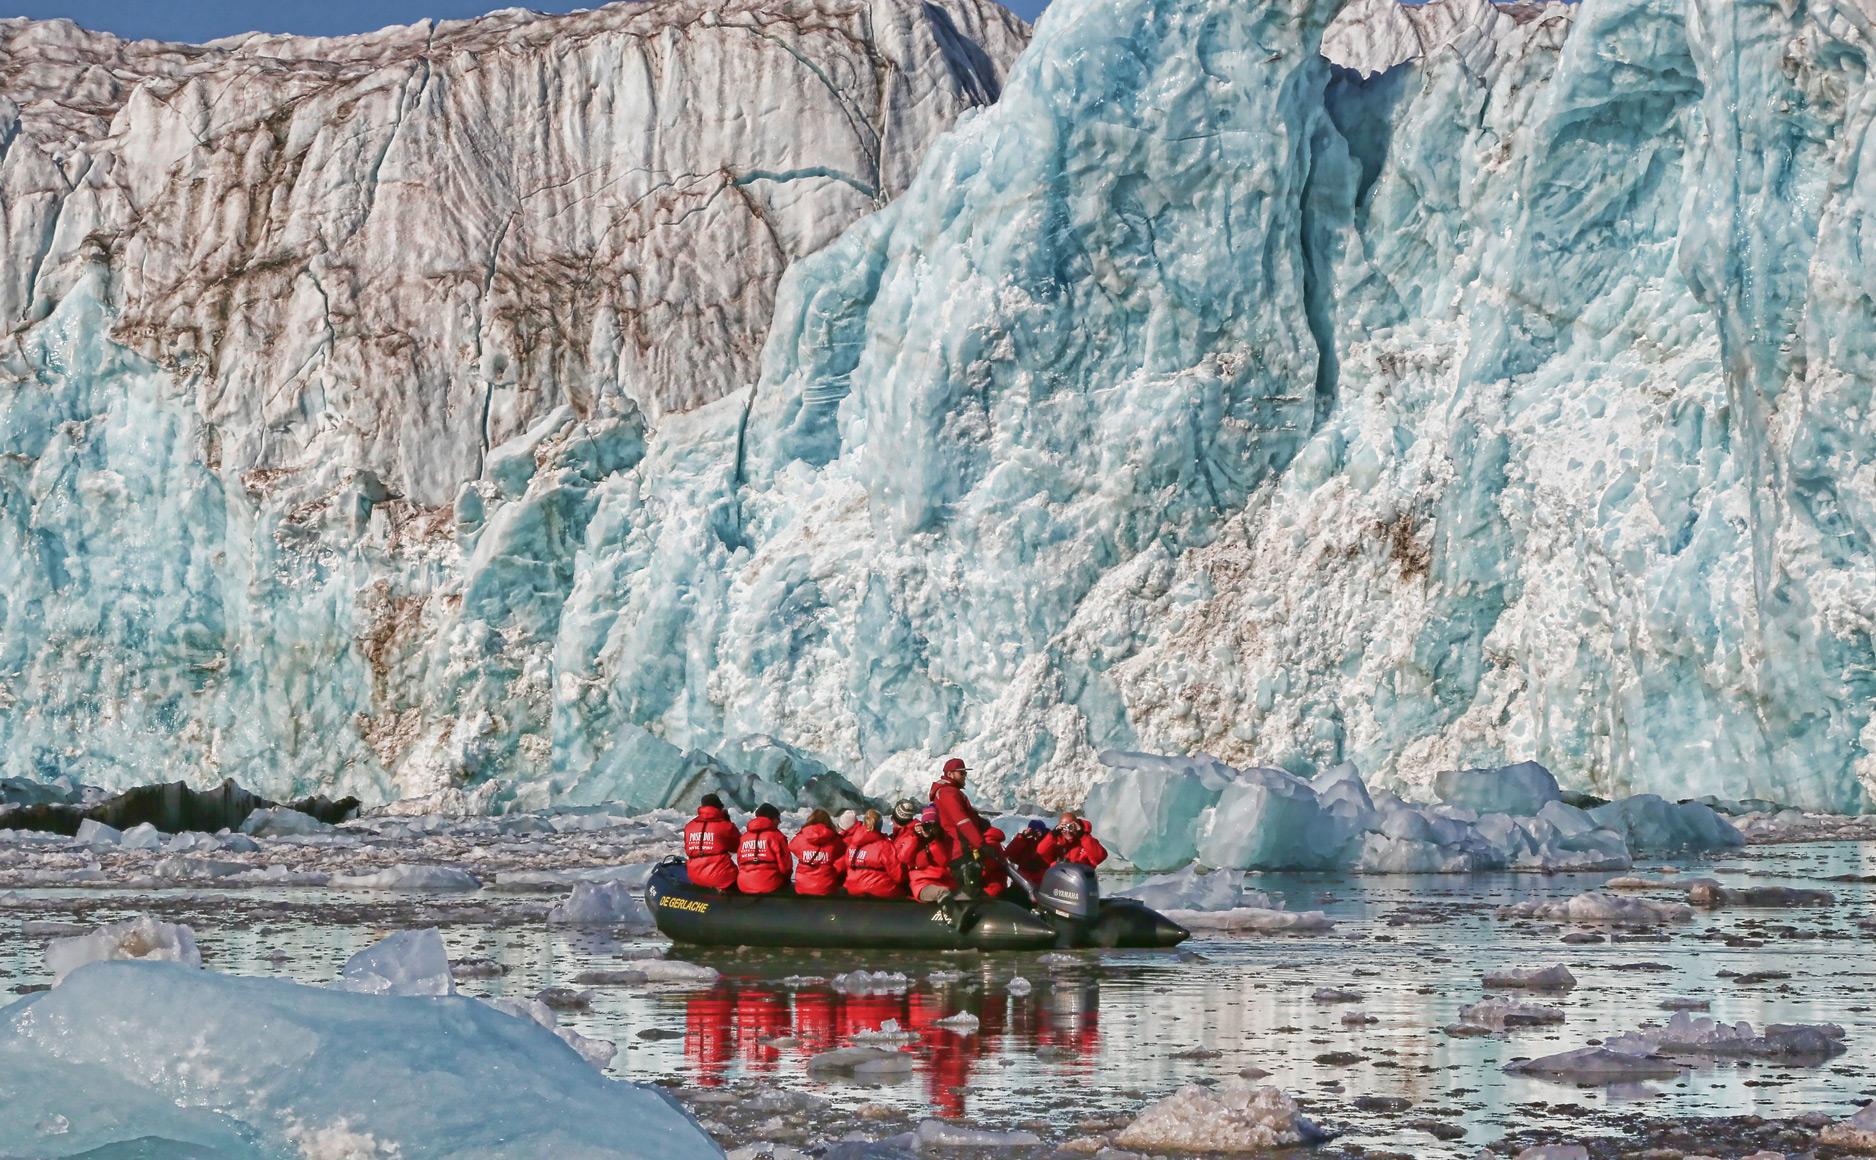 zodiac-cruise-ice-front.jpg